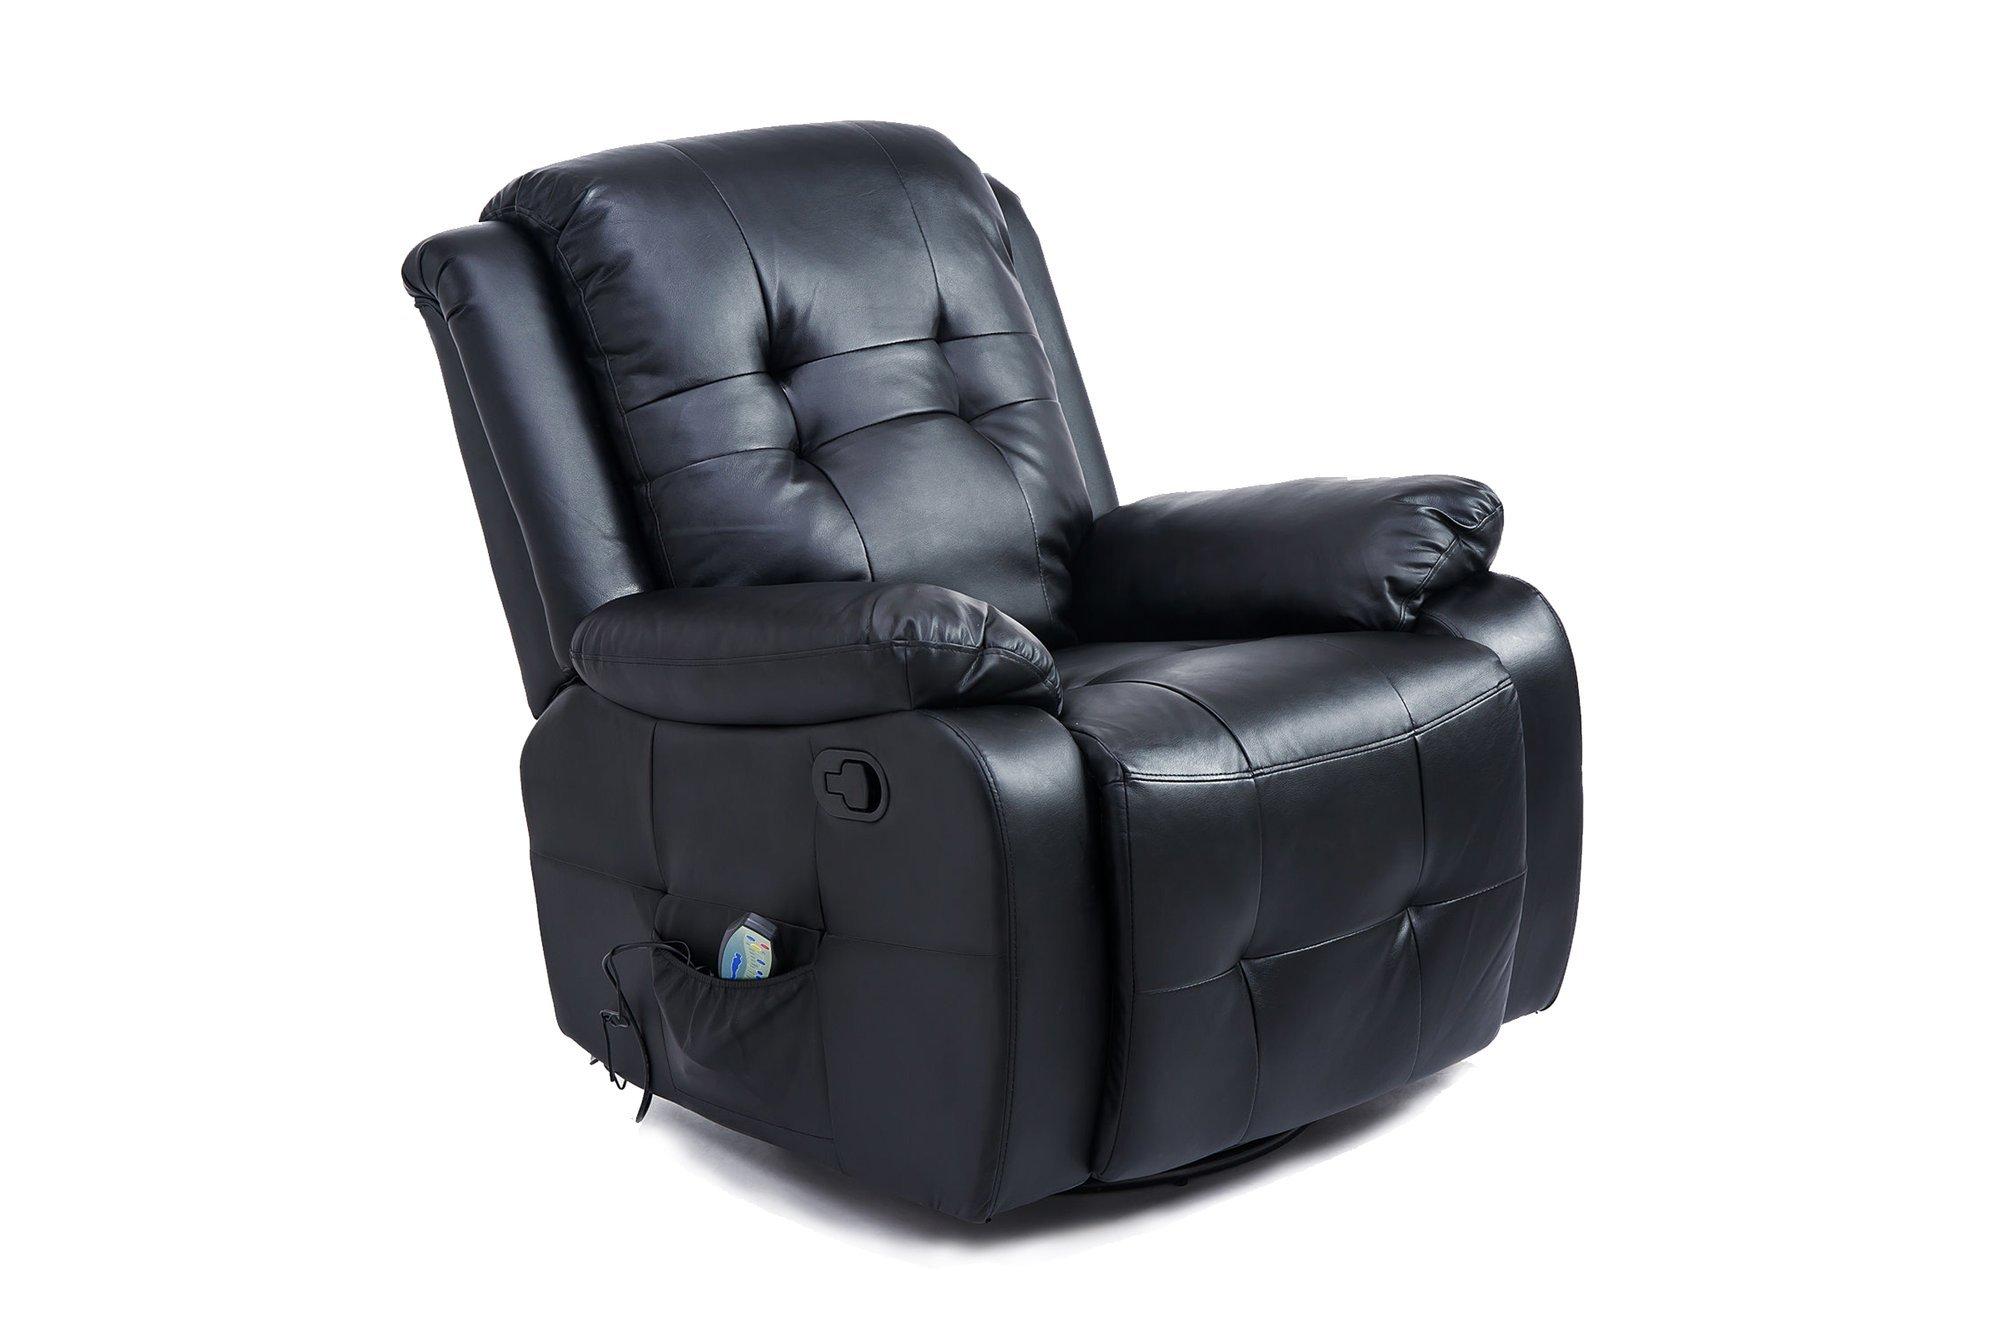 Massage chair with heating function Homcom 700-053BK Black